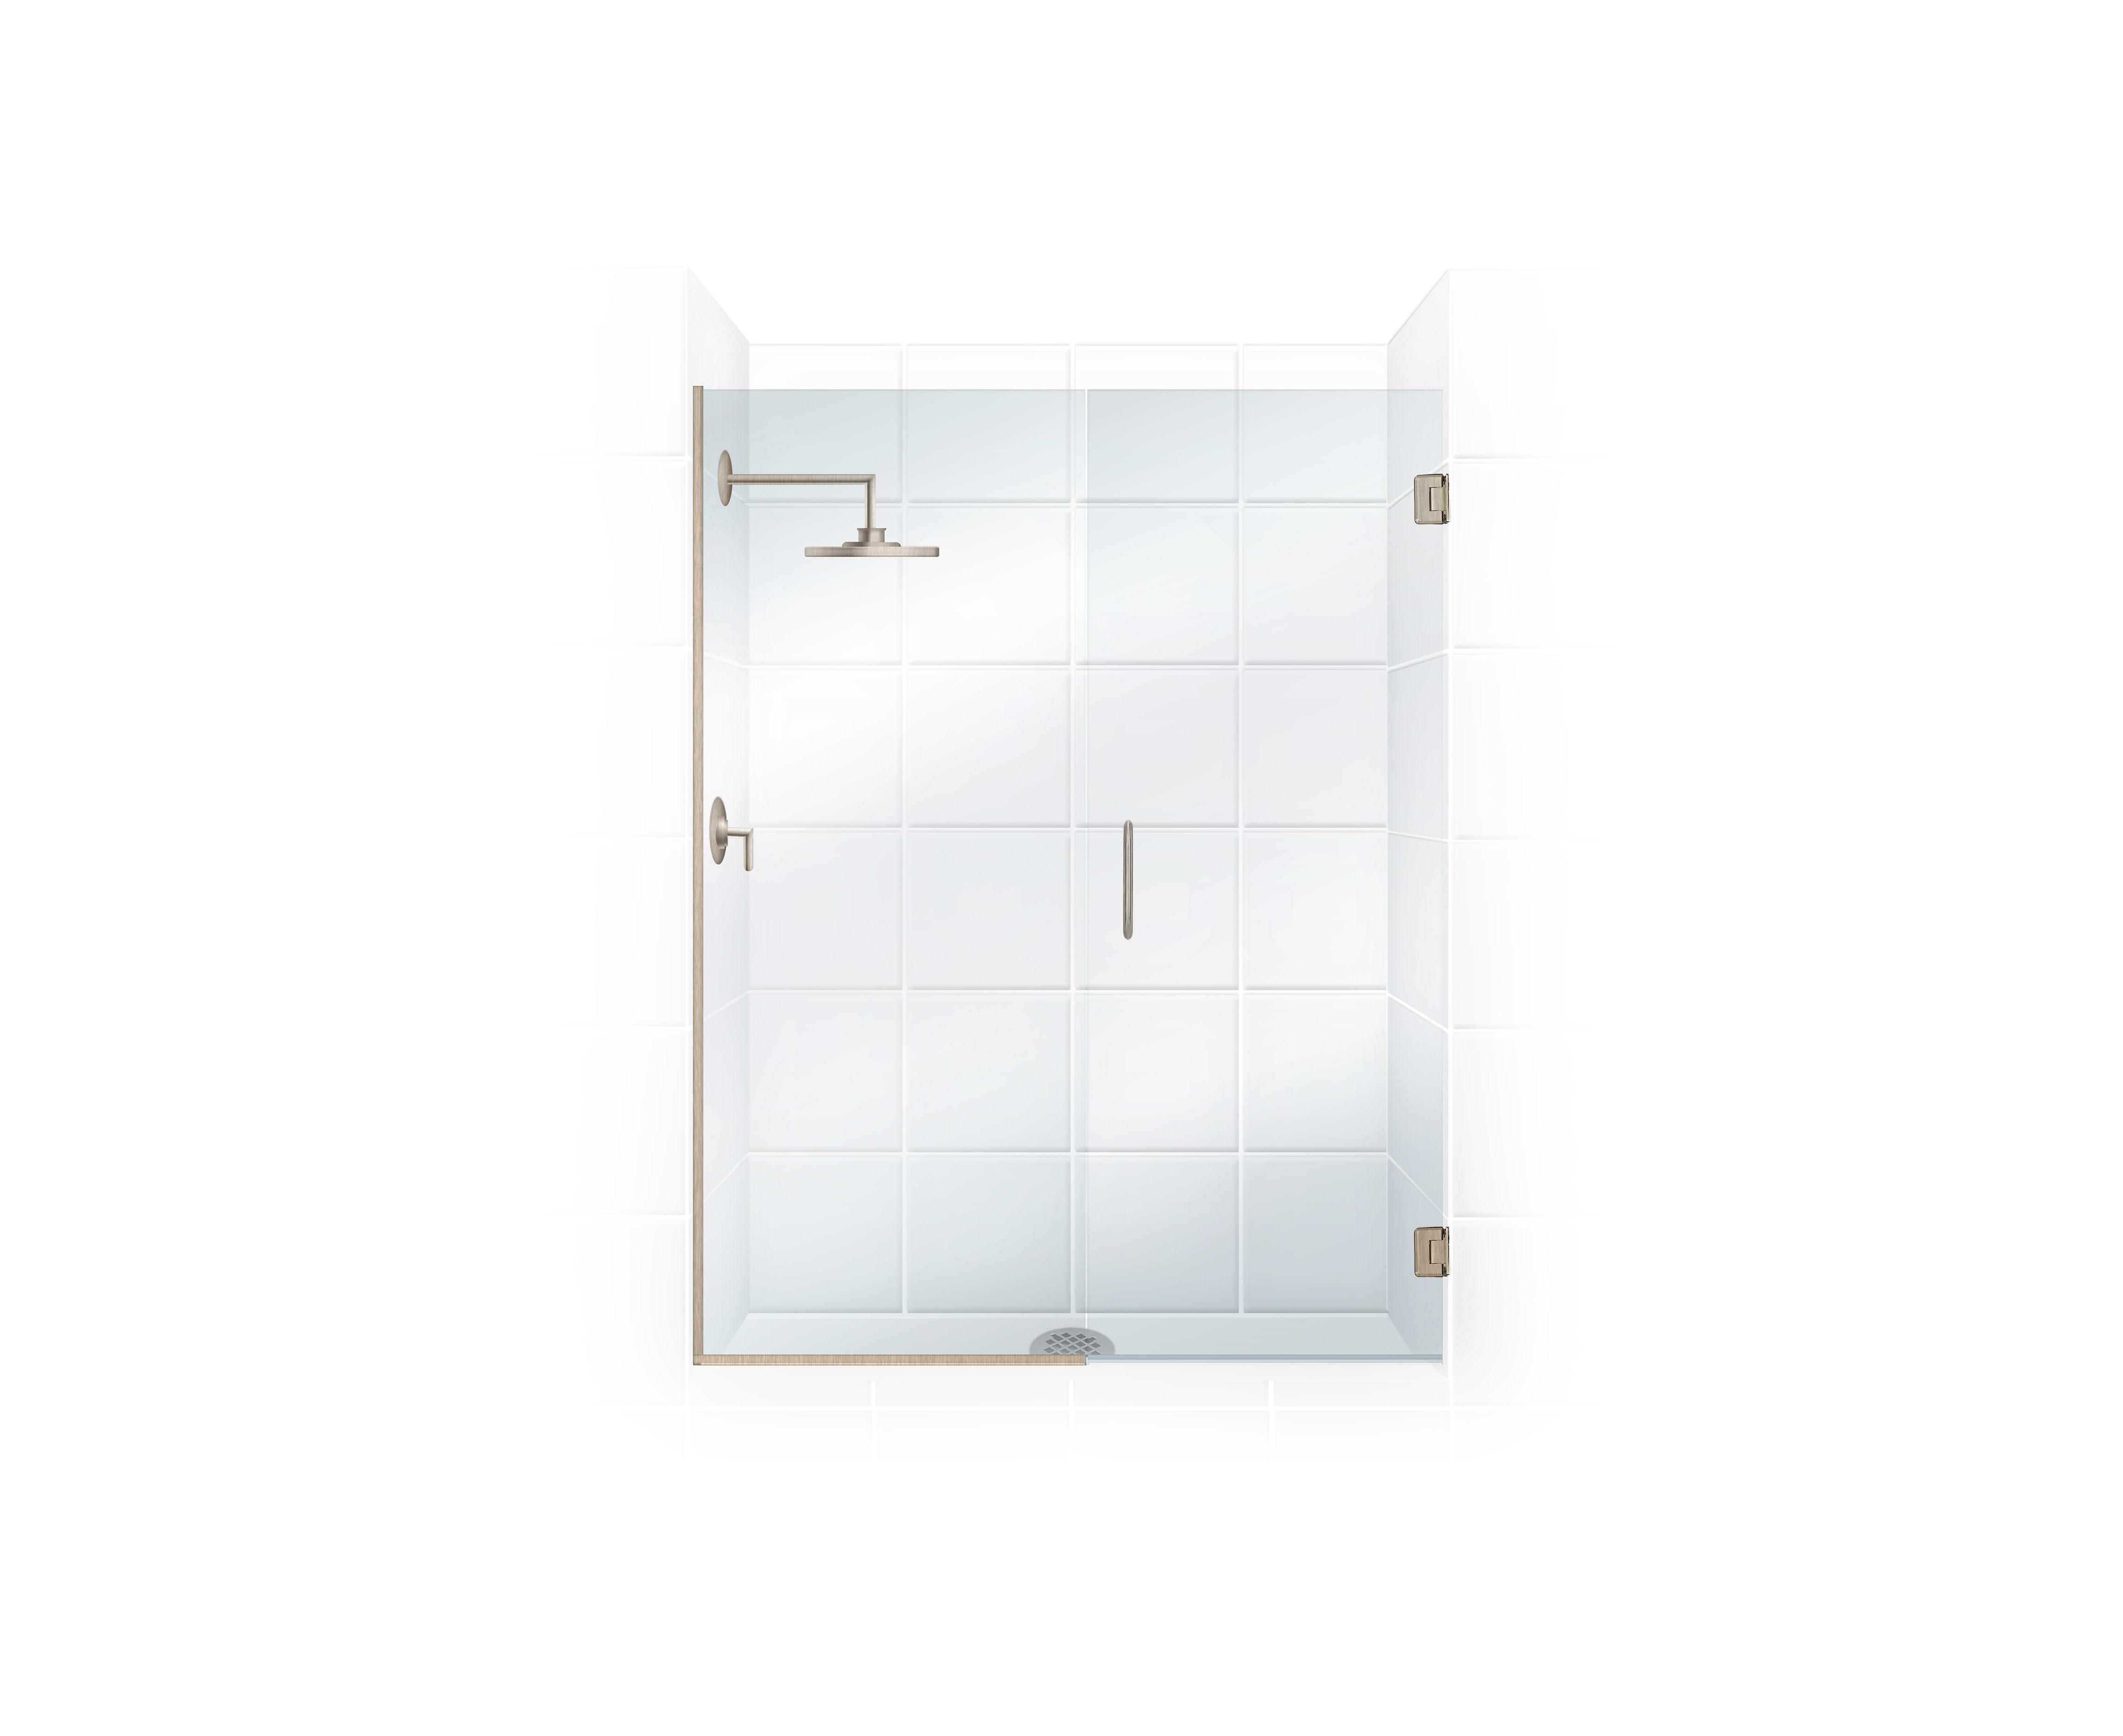 Brushed Nickel Value Line Frameless All Glass  Shower Door With Inline Panel www.coastalind.com